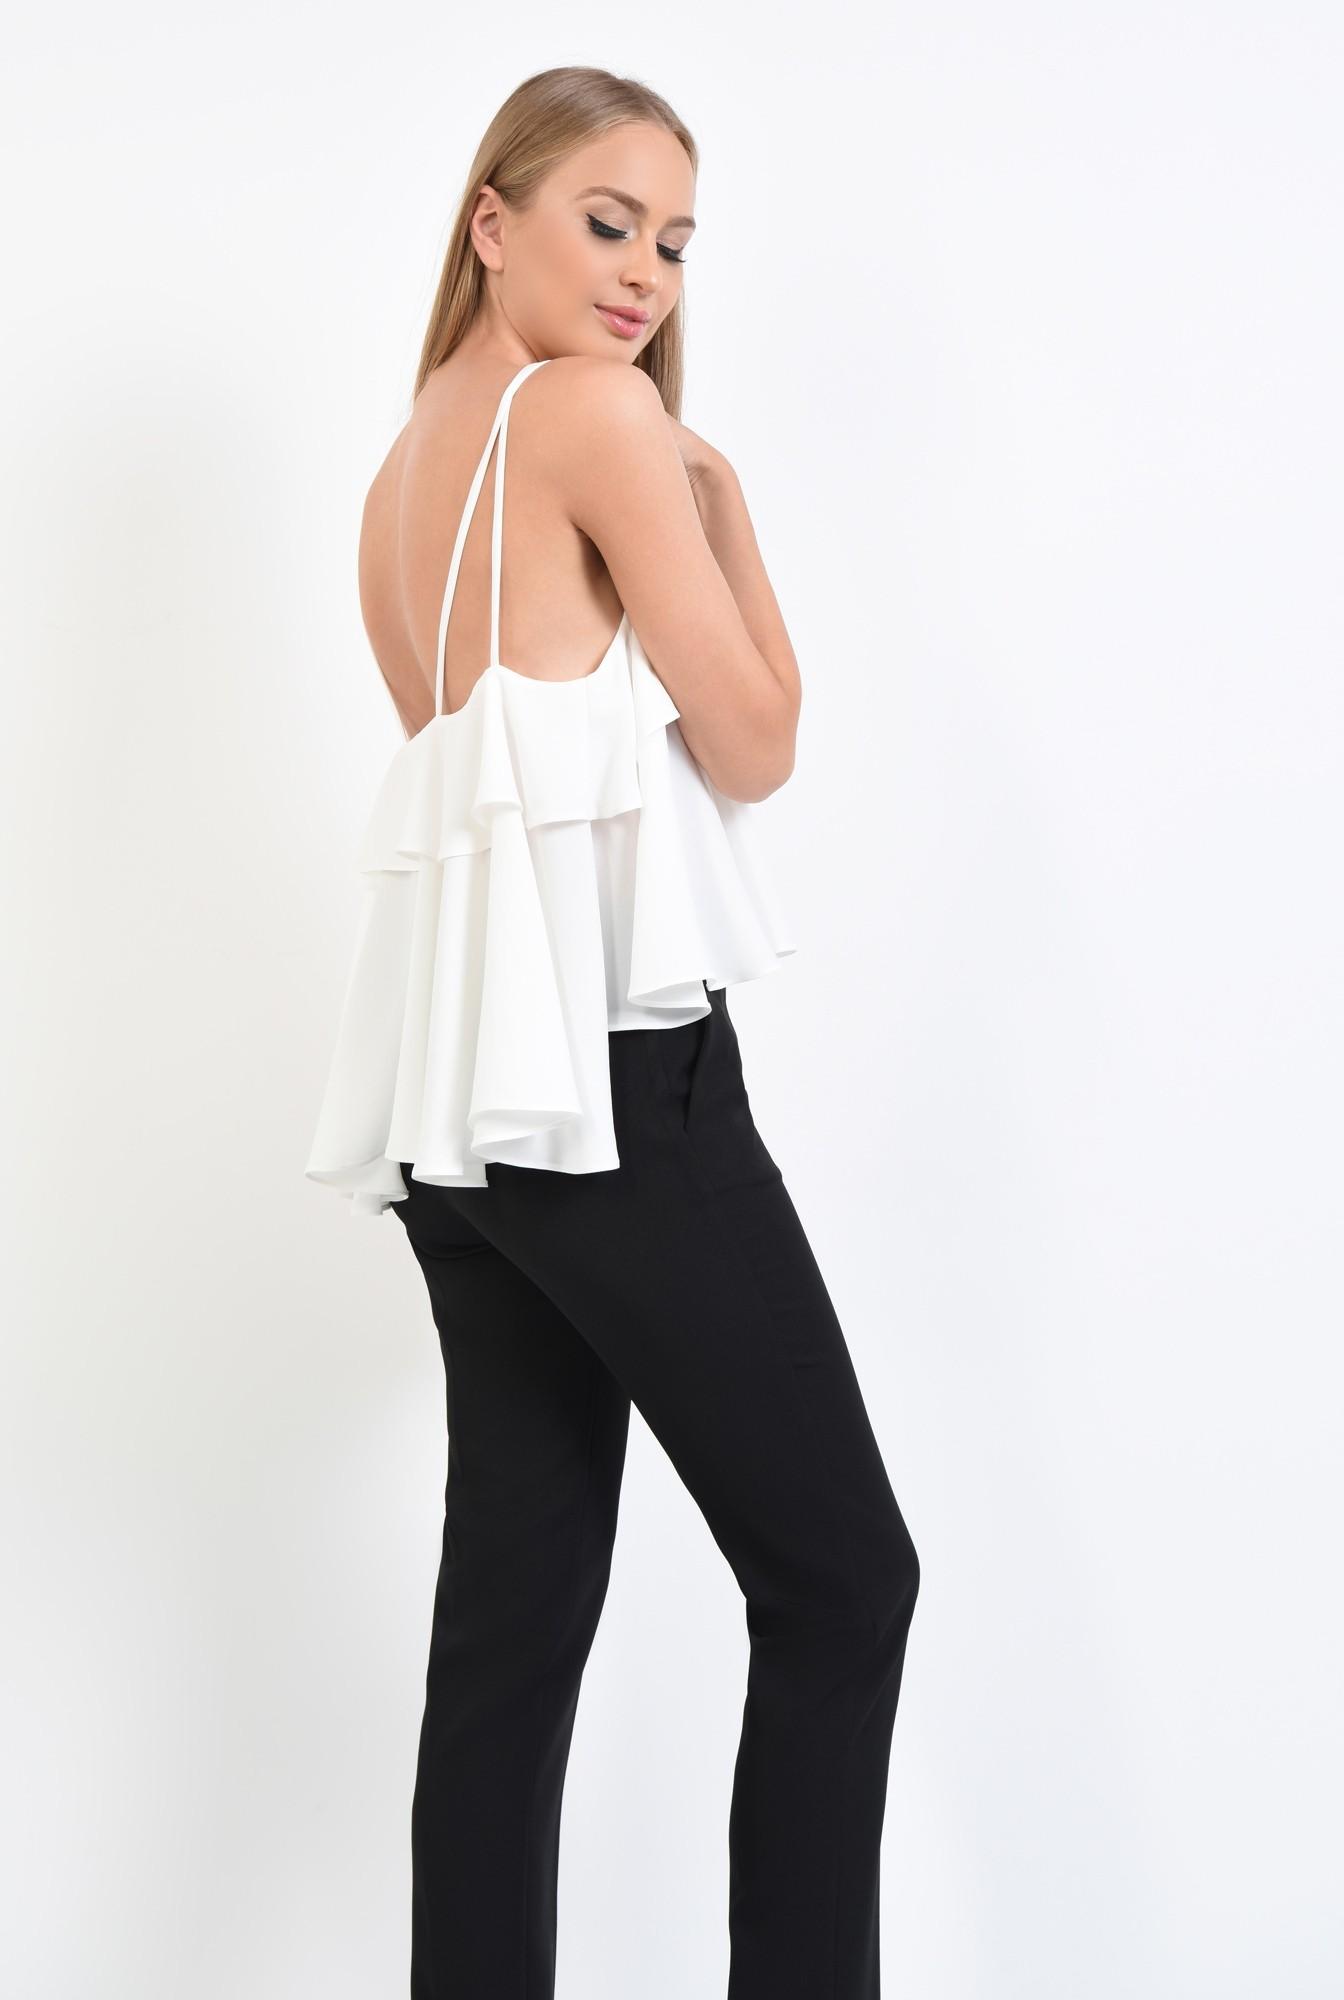 0 - 360 - bluza eleganta, alba, croi lejer, bretele fine, bluze online, lungime asimetrica